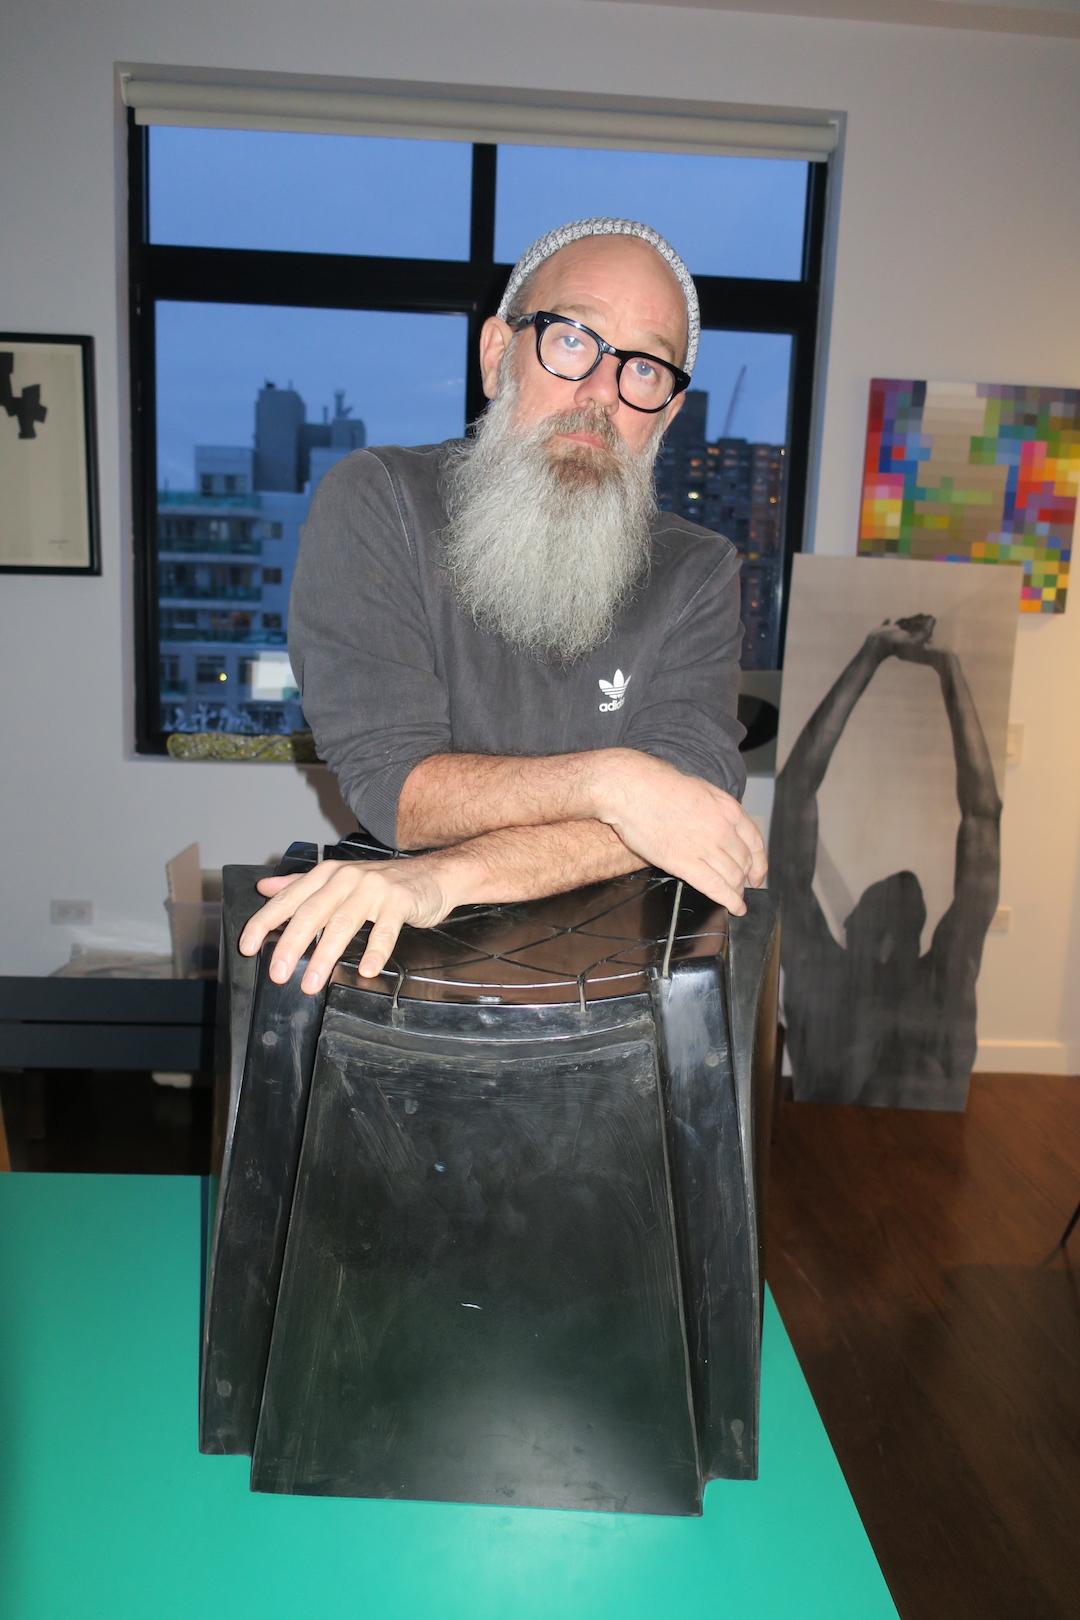 Michael Stipe on having multiple creative lives – The Creative ...